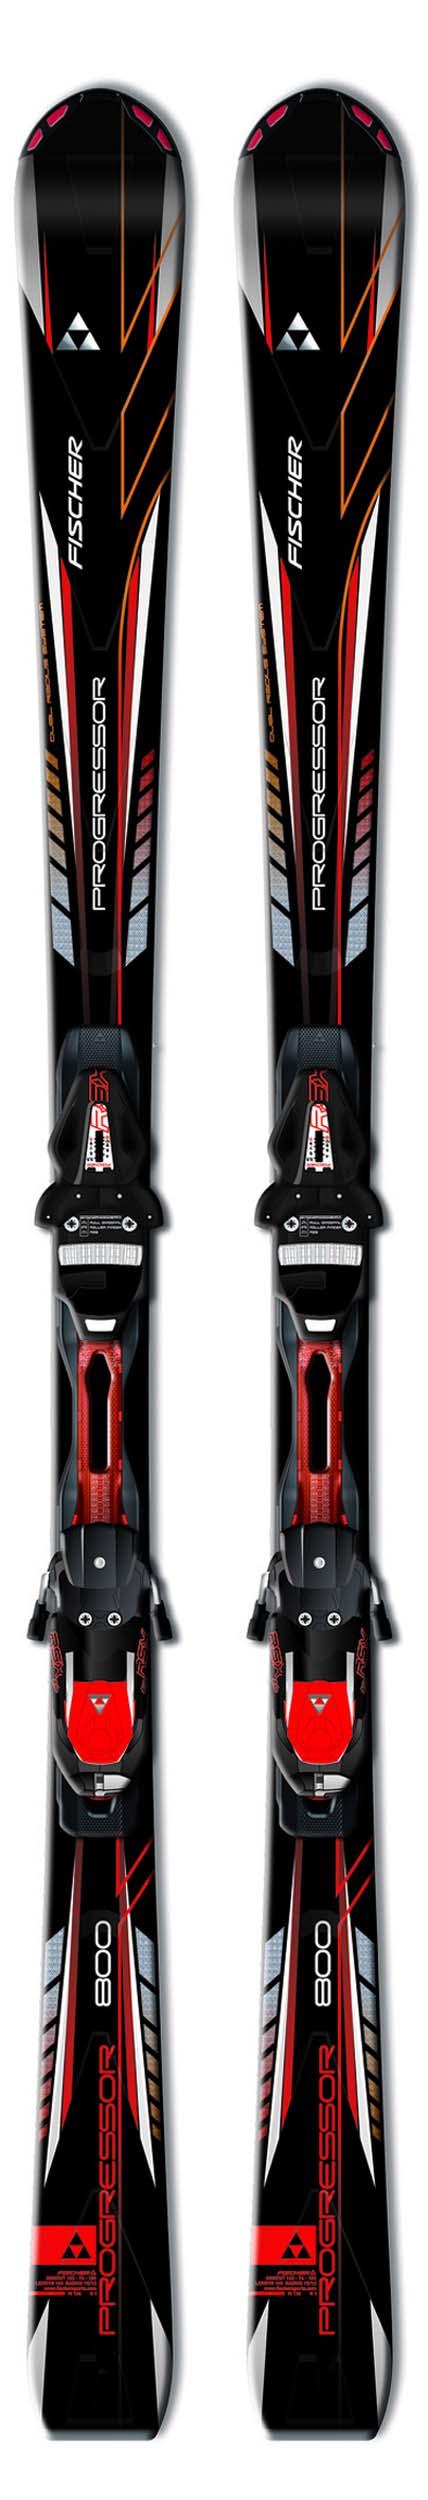 fischer 14 15 progressor 800 skis w rsx 12 bindings new. Black Bedroom Furniture Sets. Home Design Ideas